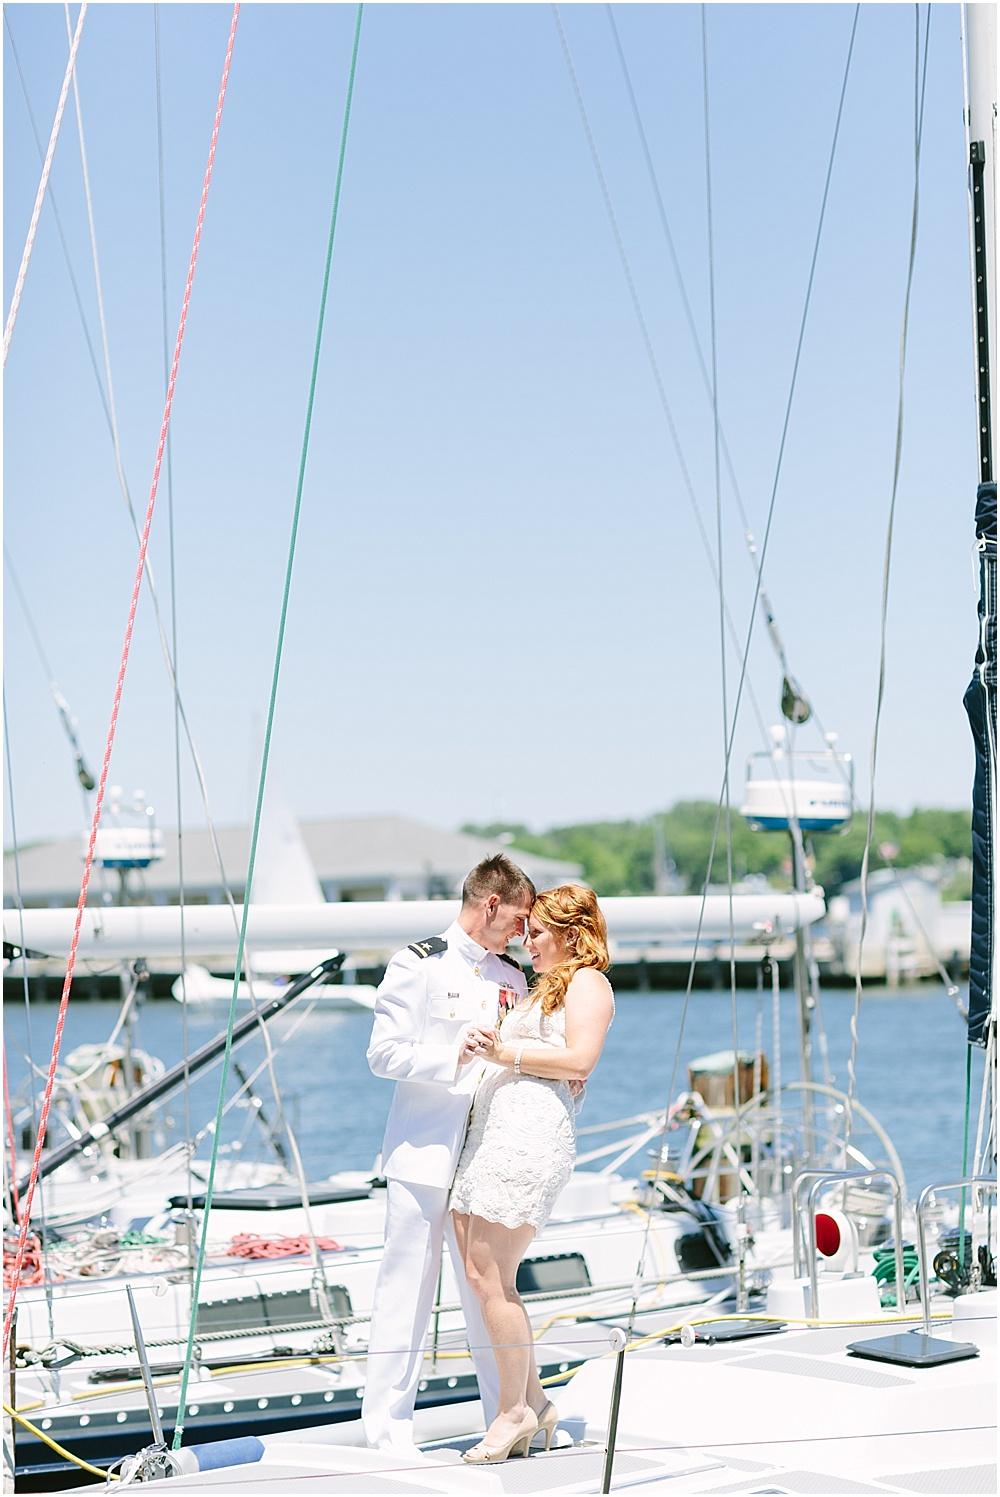 Allison_Nick_United_States_Naval_Academy_Annapolis_Wedding_Photographer_0006